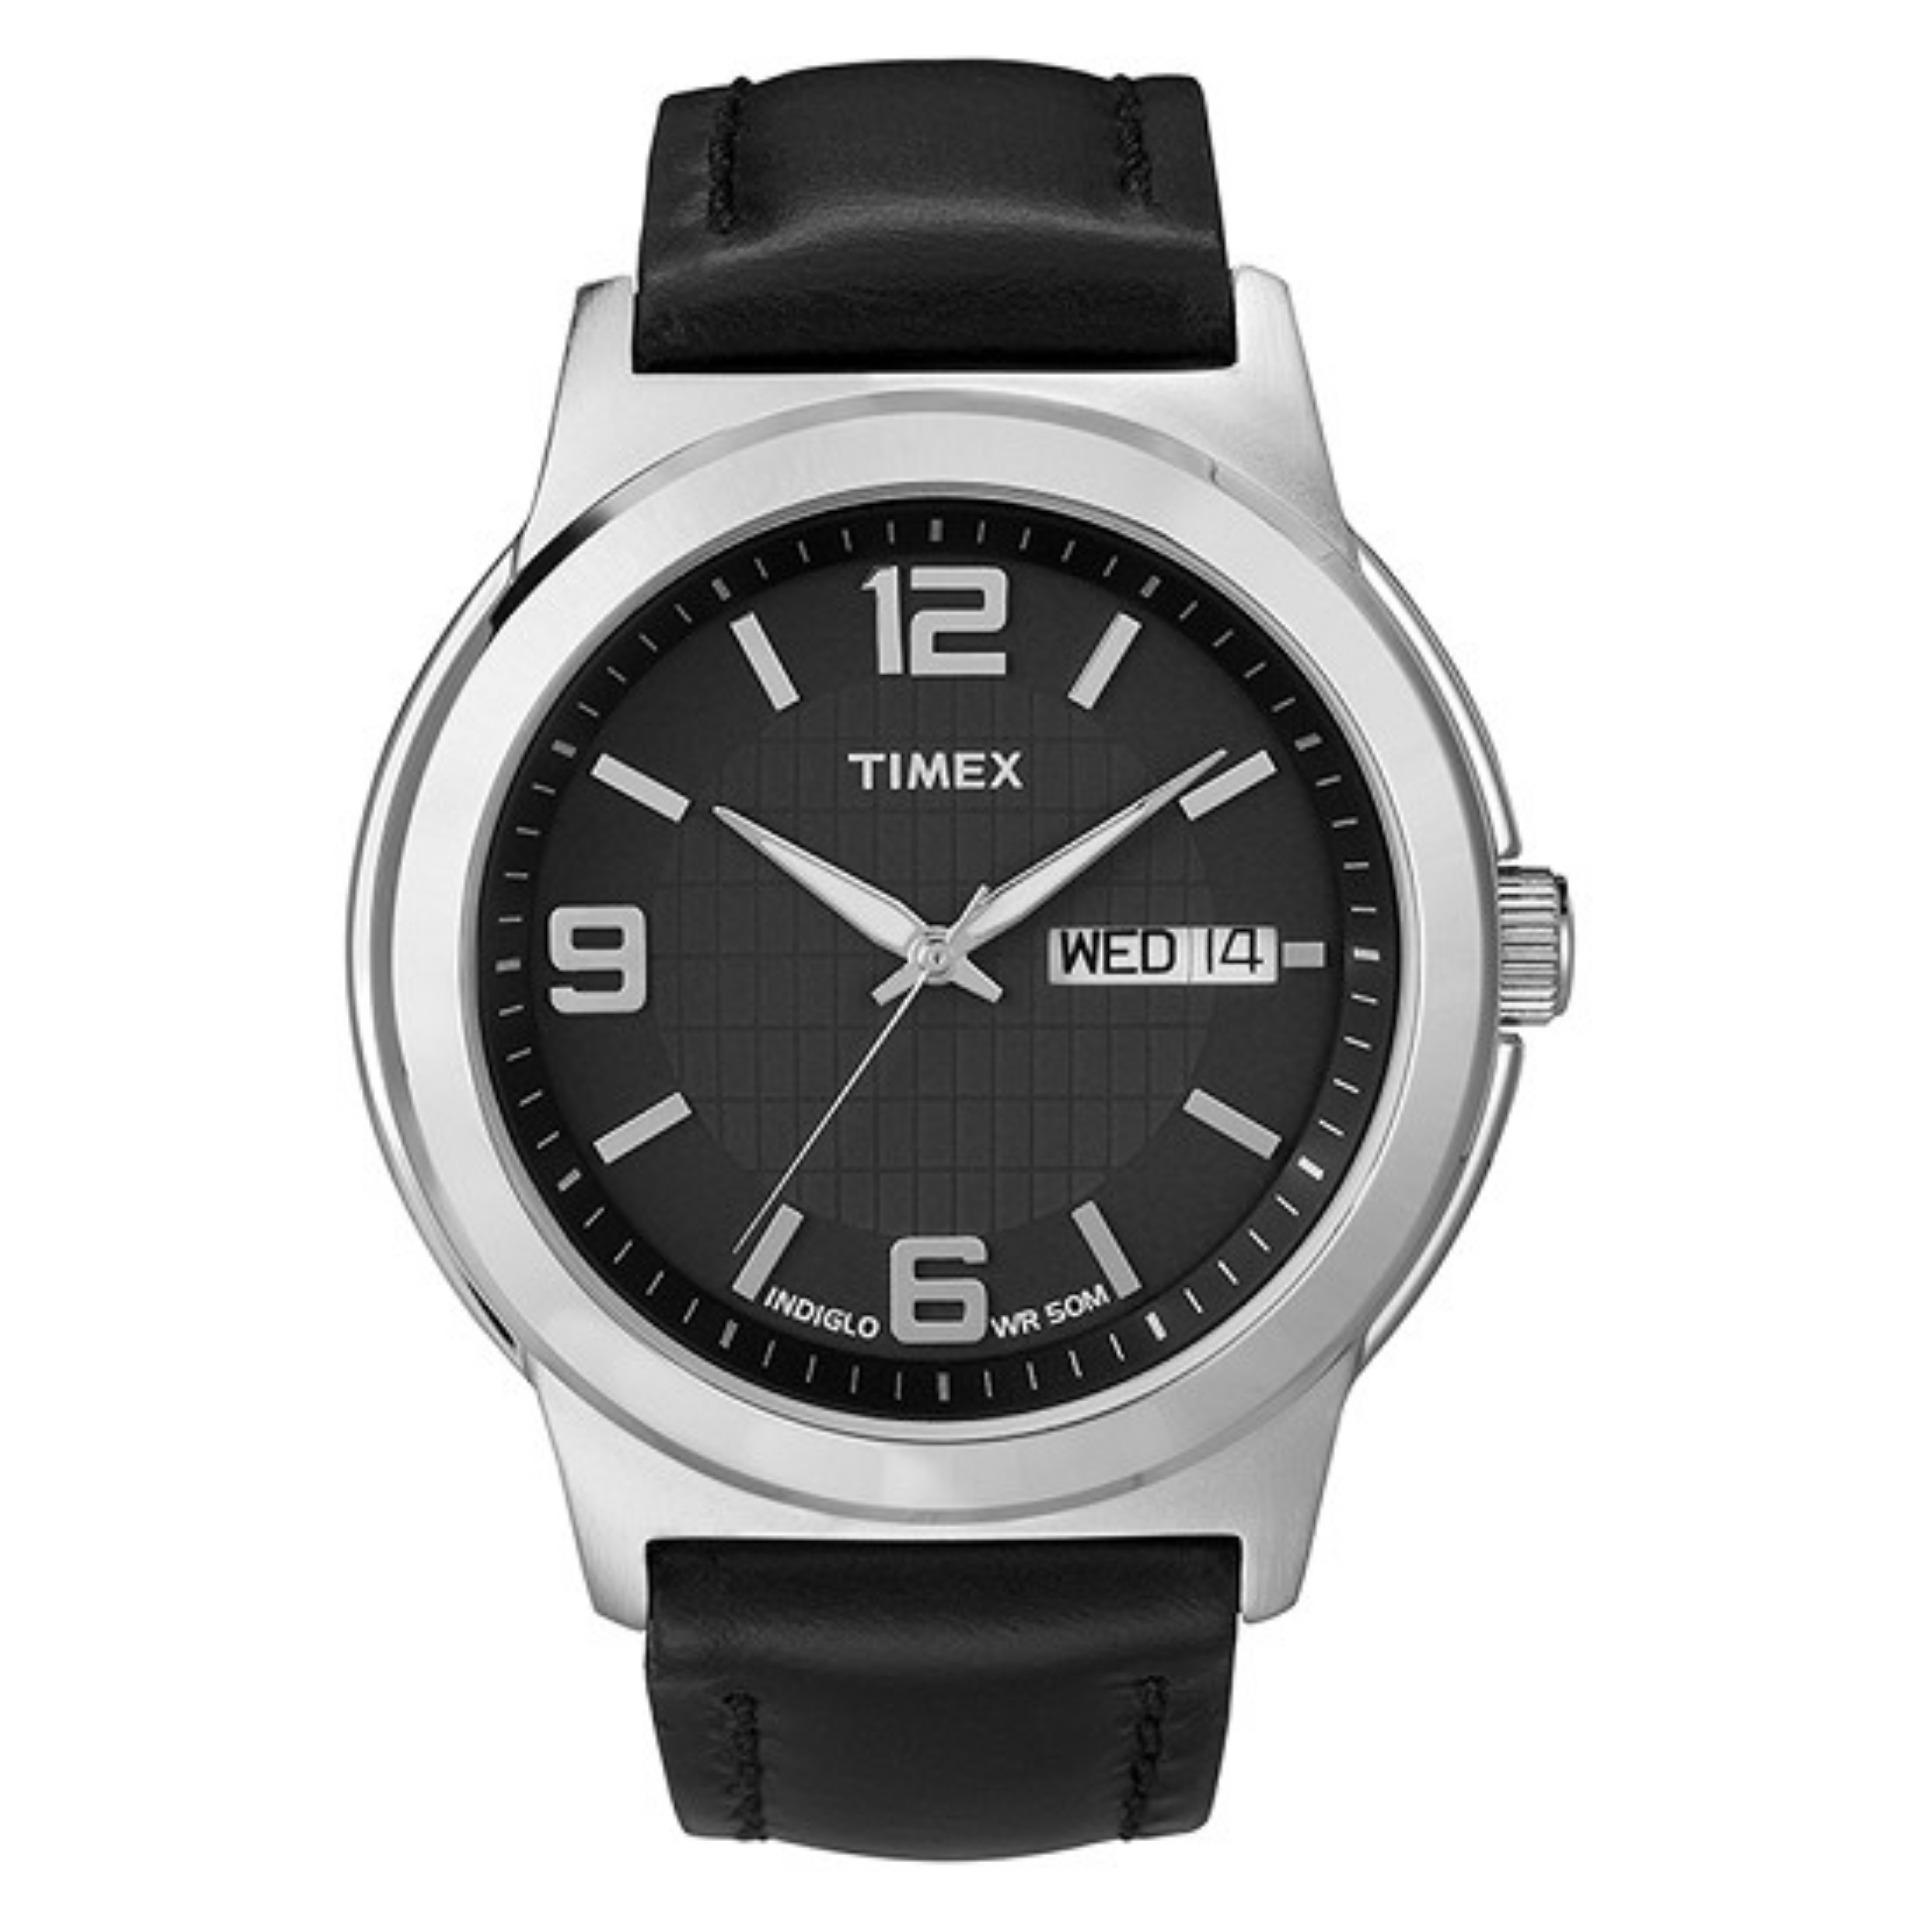 Mua Online Ng H Timex Cht Lng Cao Gi Tt Ti Lazada Weekender Fairfield Chronograph Tw2r37800 Original Dy Da T2e561